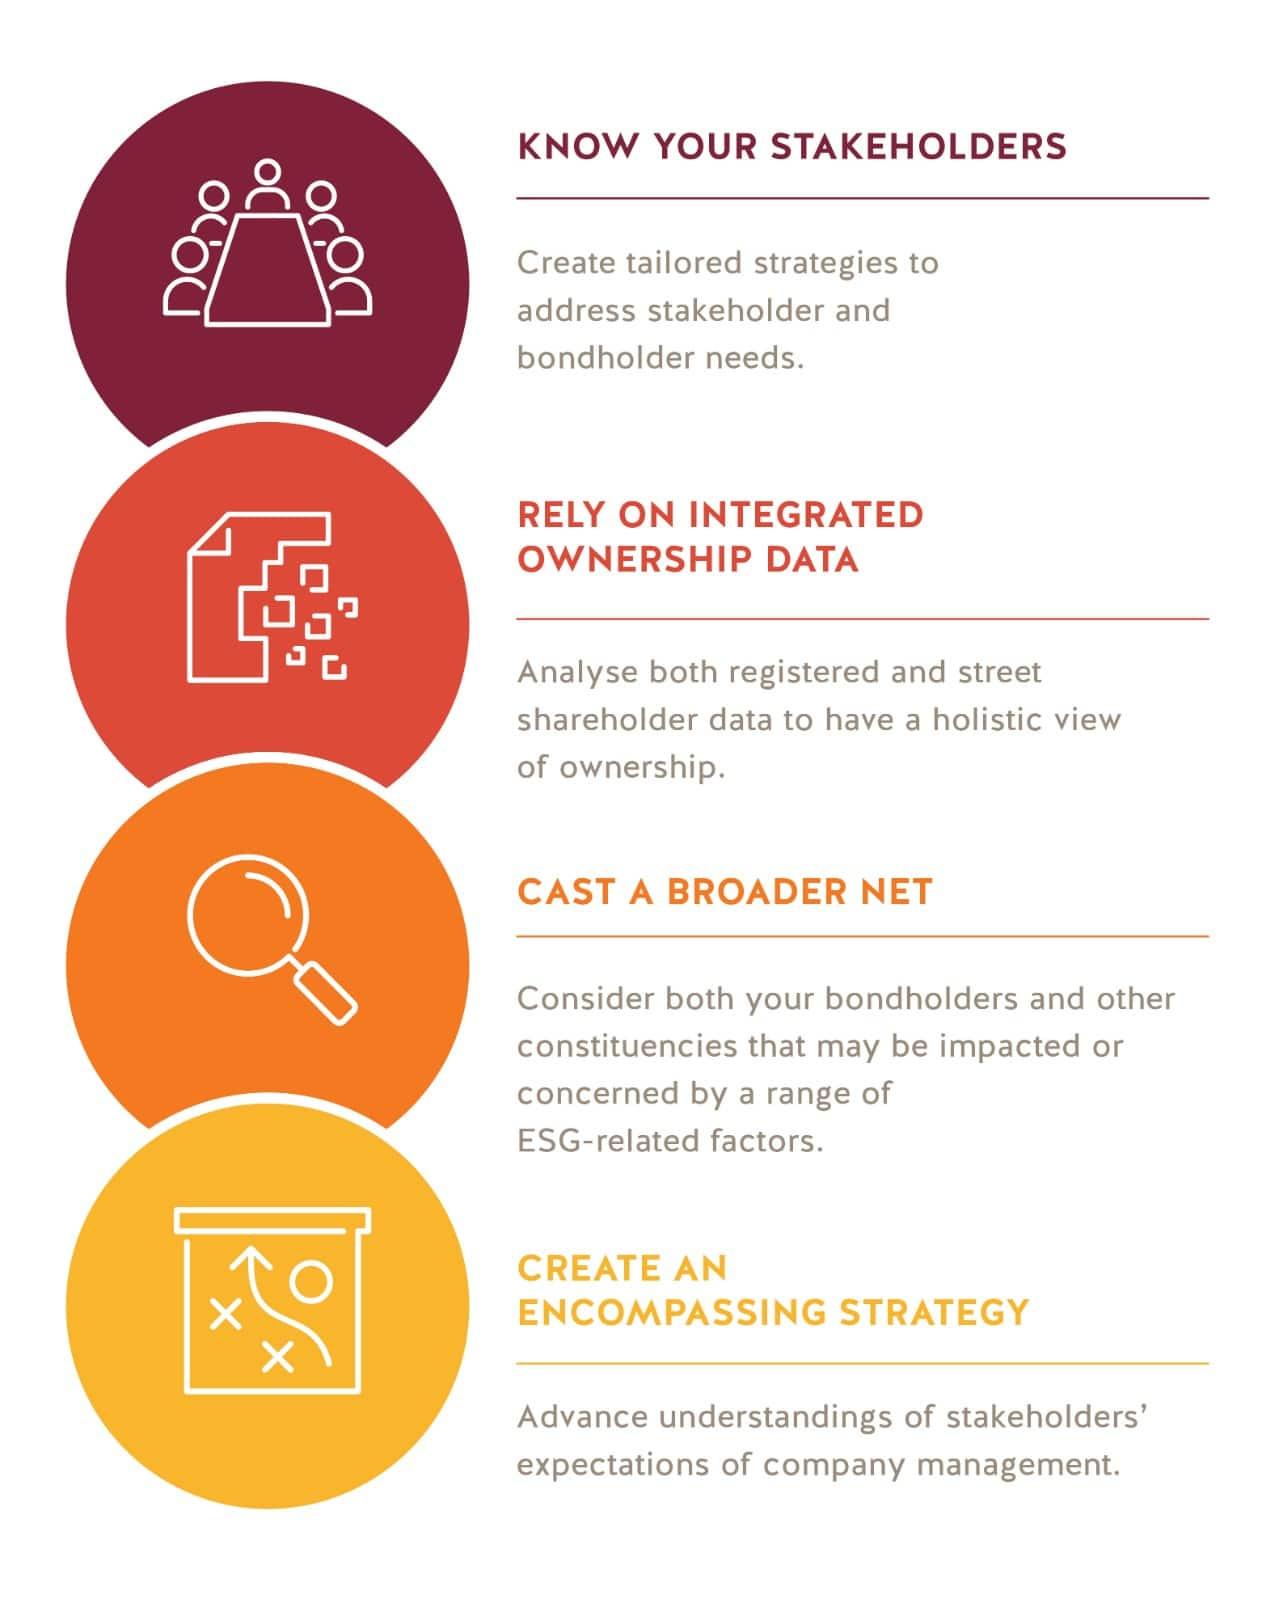 Next-Generation Shareholder Intelligence Ethical Boardroom